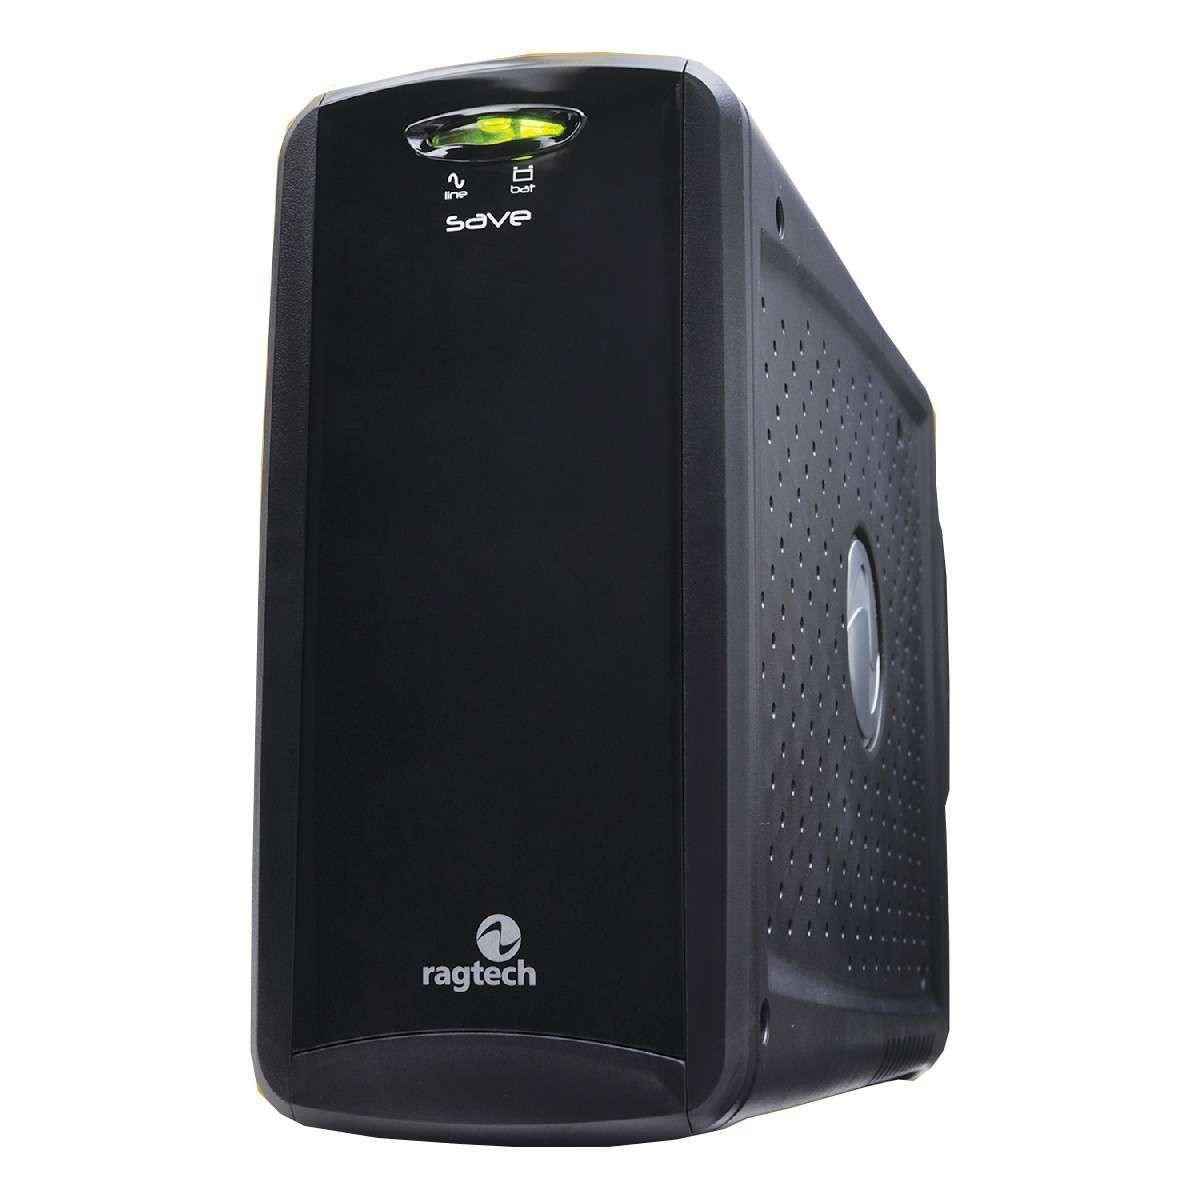 NoBreak Ragtech Save Home 600STD-TI Black- Semi Senoidal - 600VA Trivolt - 20NSH4125